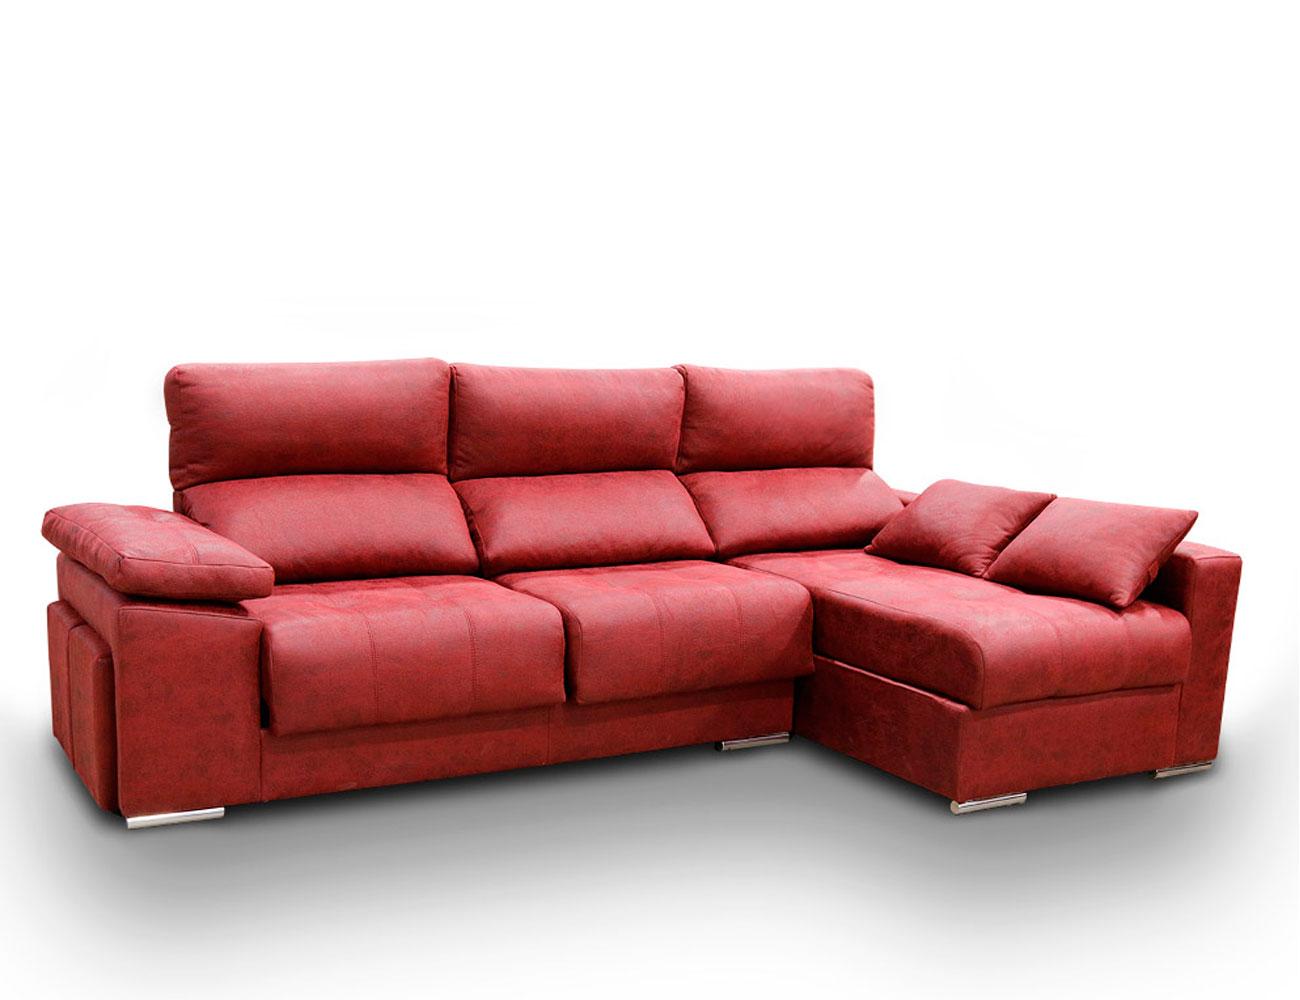 Sofa chaiselongue anti manchas rojo granate15